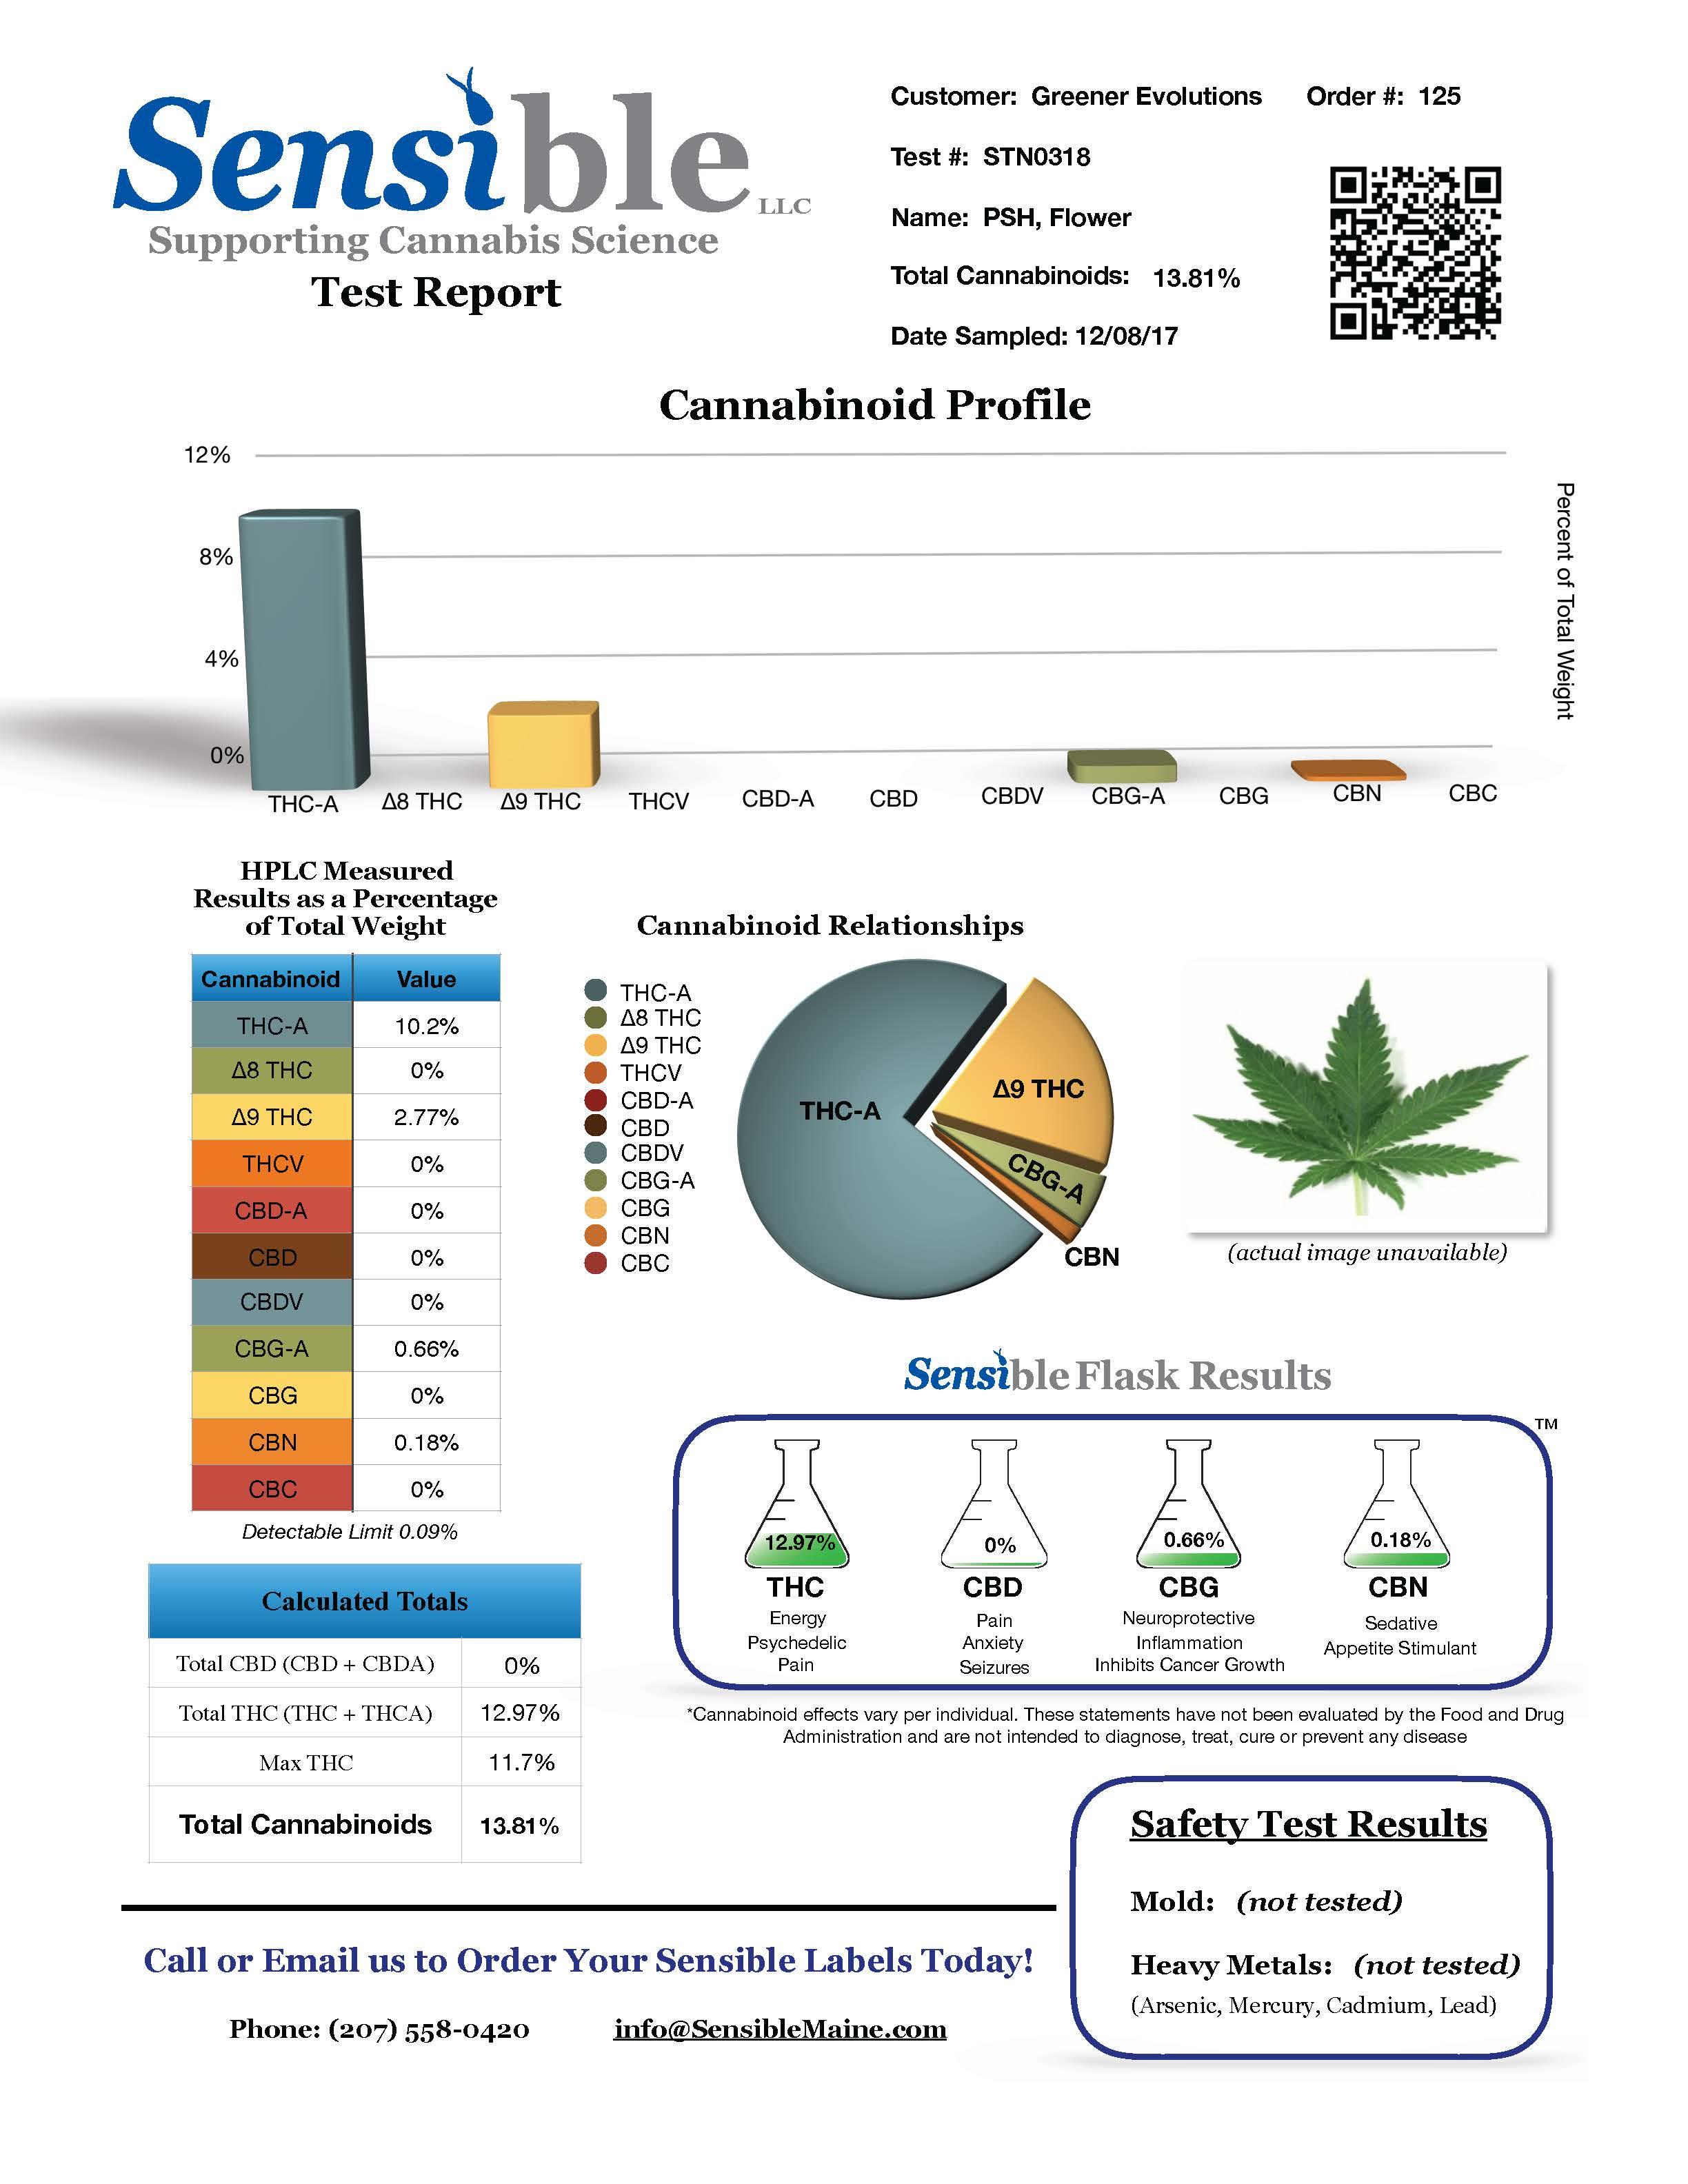 Test Report stn0318.jpg